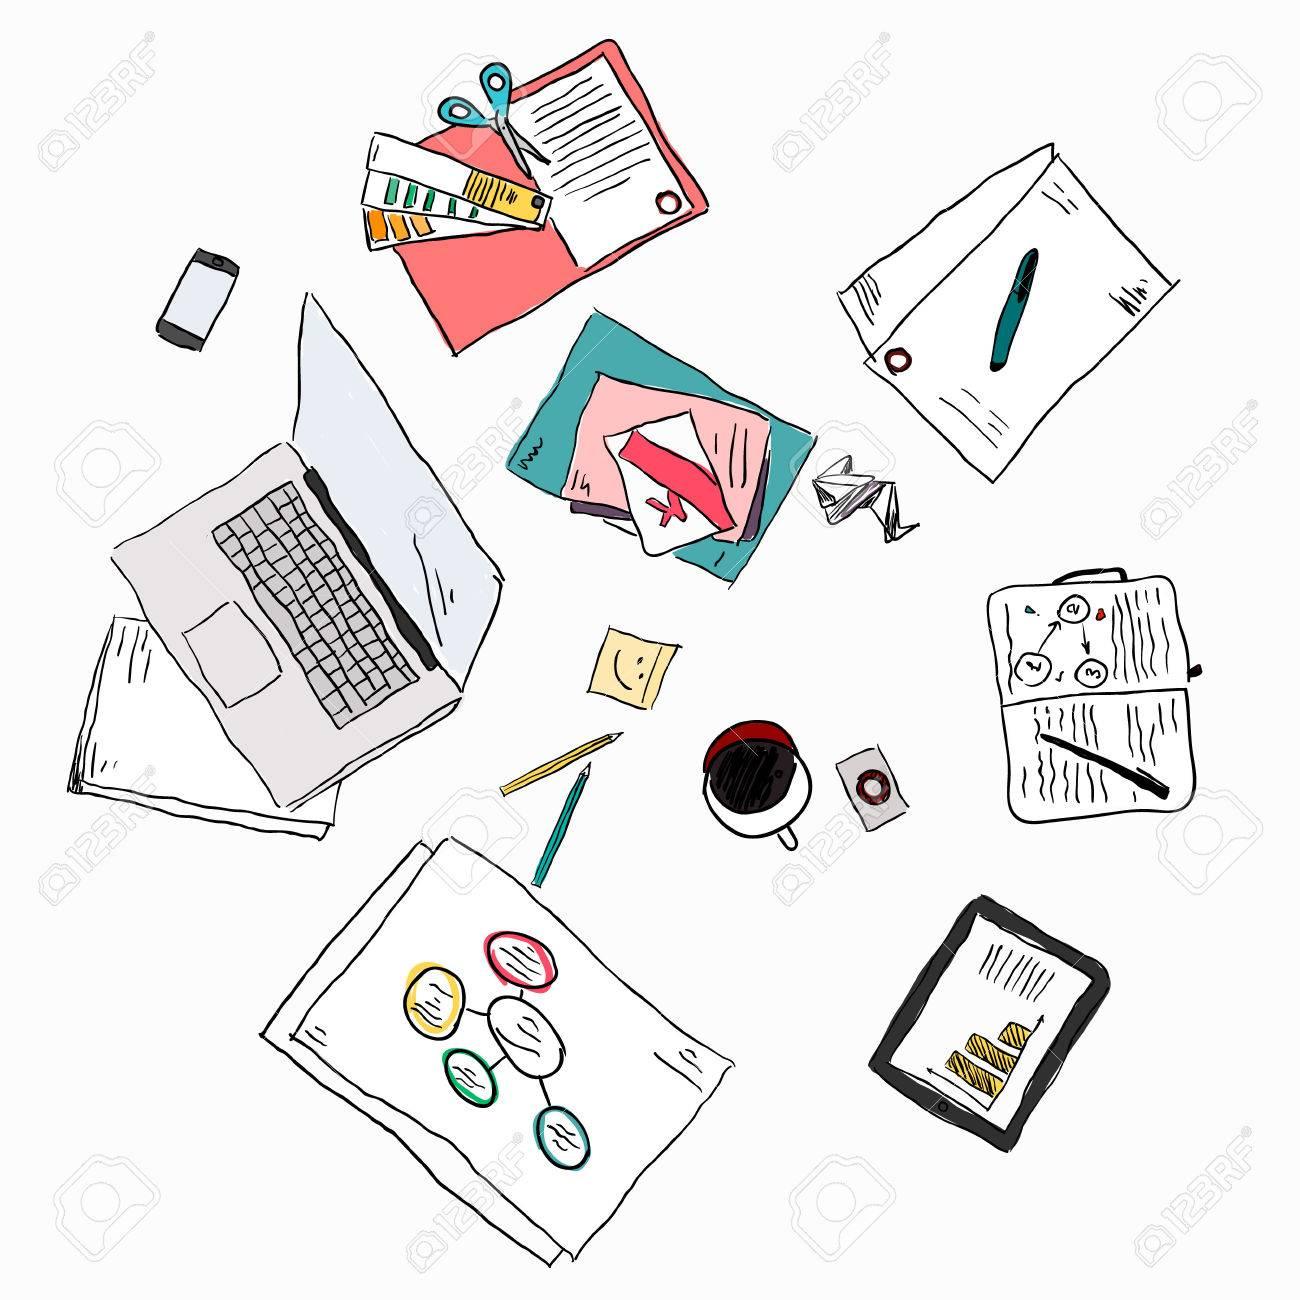 Business meeting concept top view people hands sketch - 36765795